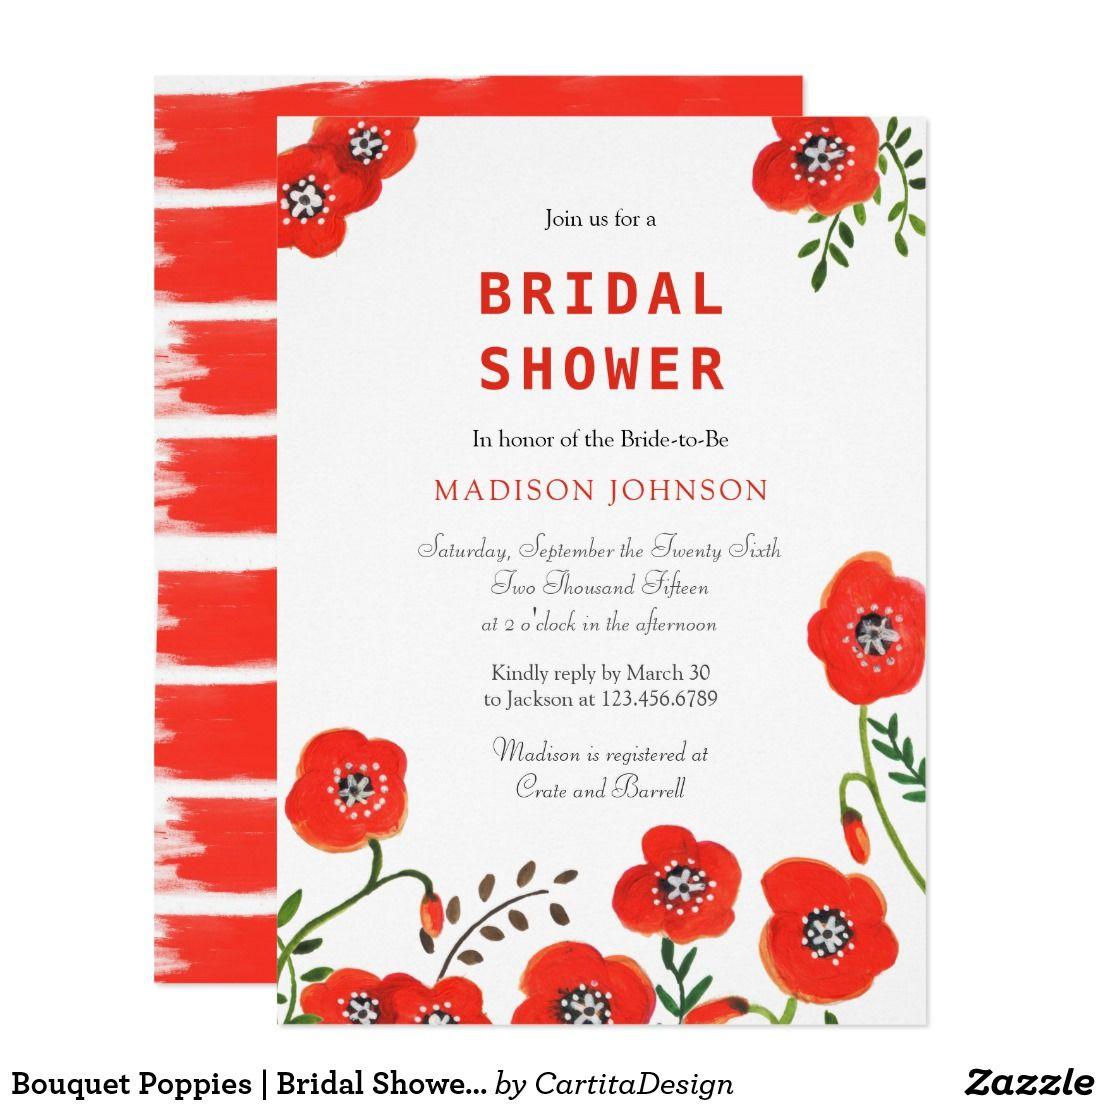 Bouquet Poppies | Bridal Shower | Invitation Card Cartita design ...